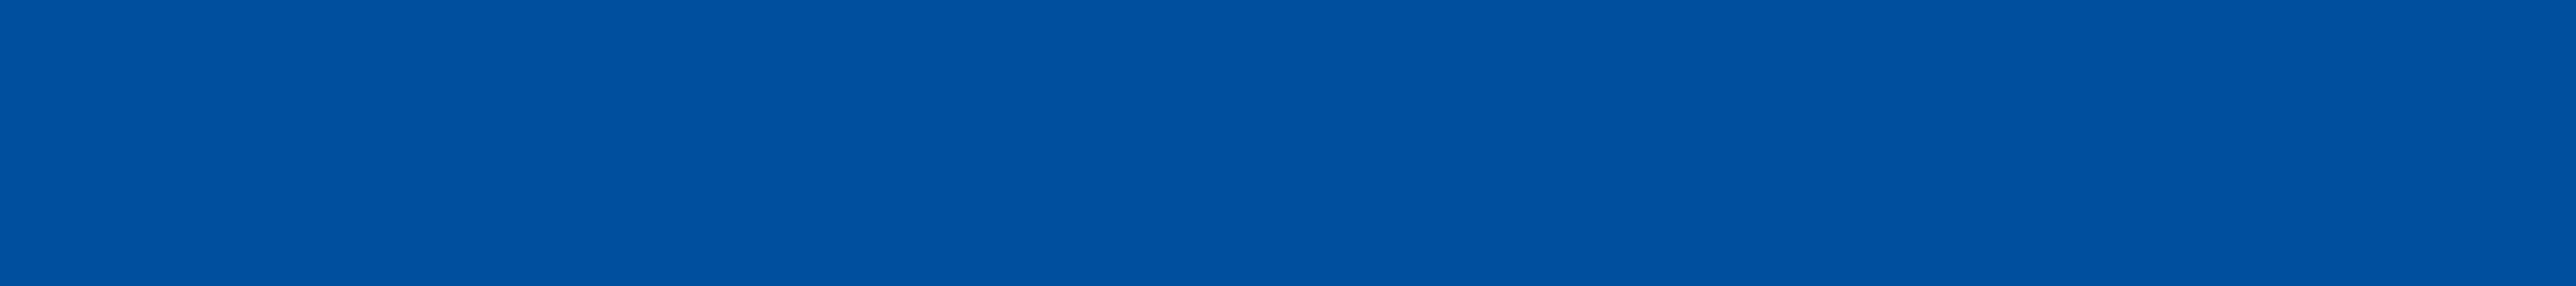 blu_prevent_katrin